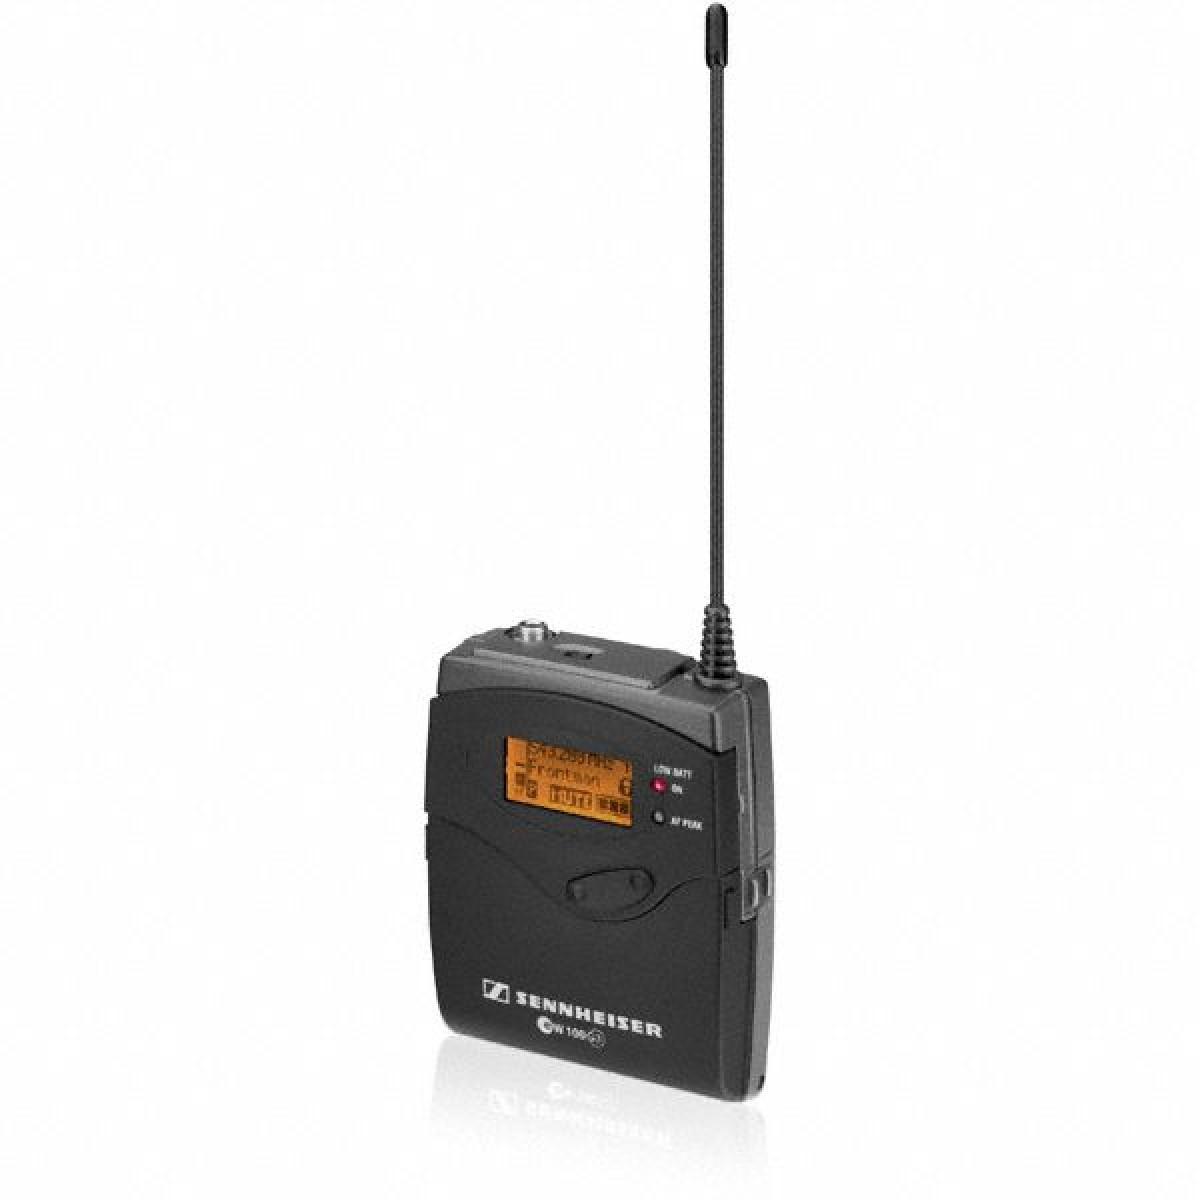 Sennheiser SK 100 G3-A-X Wireless Bodypack Transmitter - Microphones